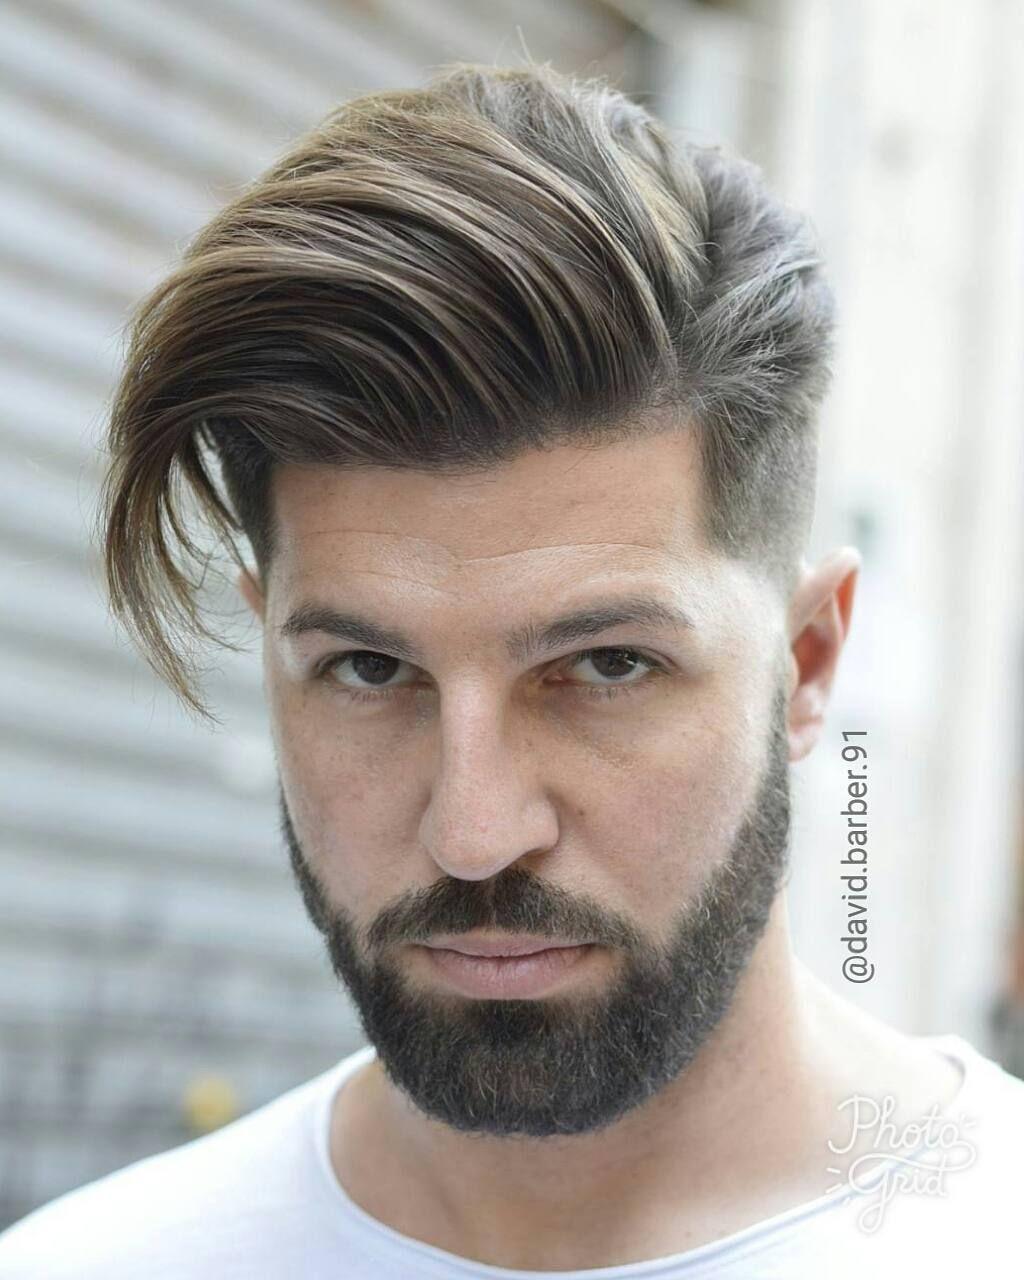 bearded 🧔🏻 gorgeous | beard in 2019 | hair cuts, hair styles, hair